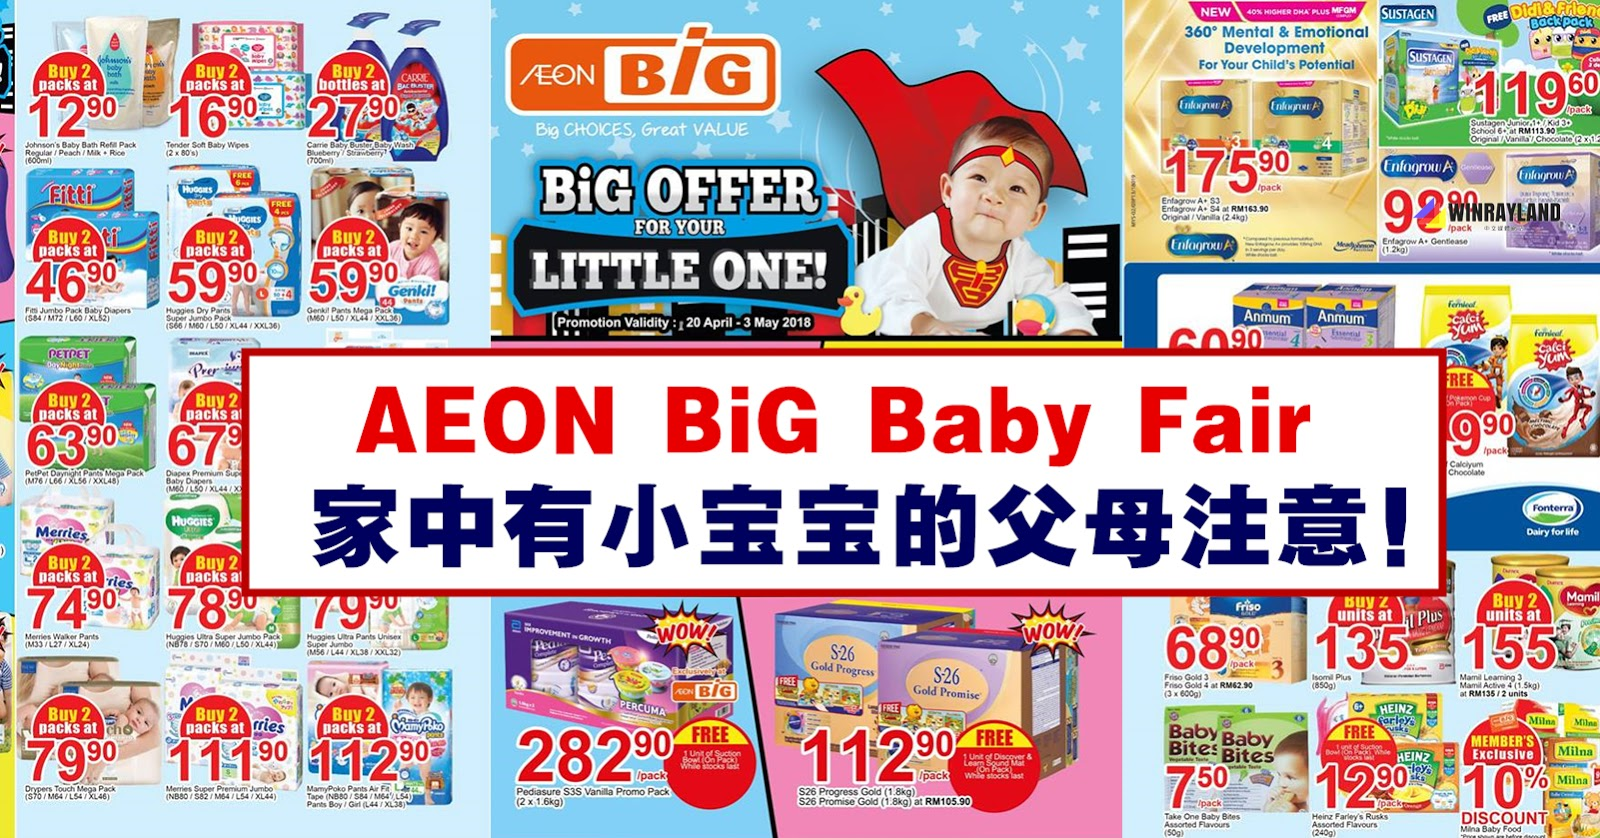 AEON BiG Baby Fair